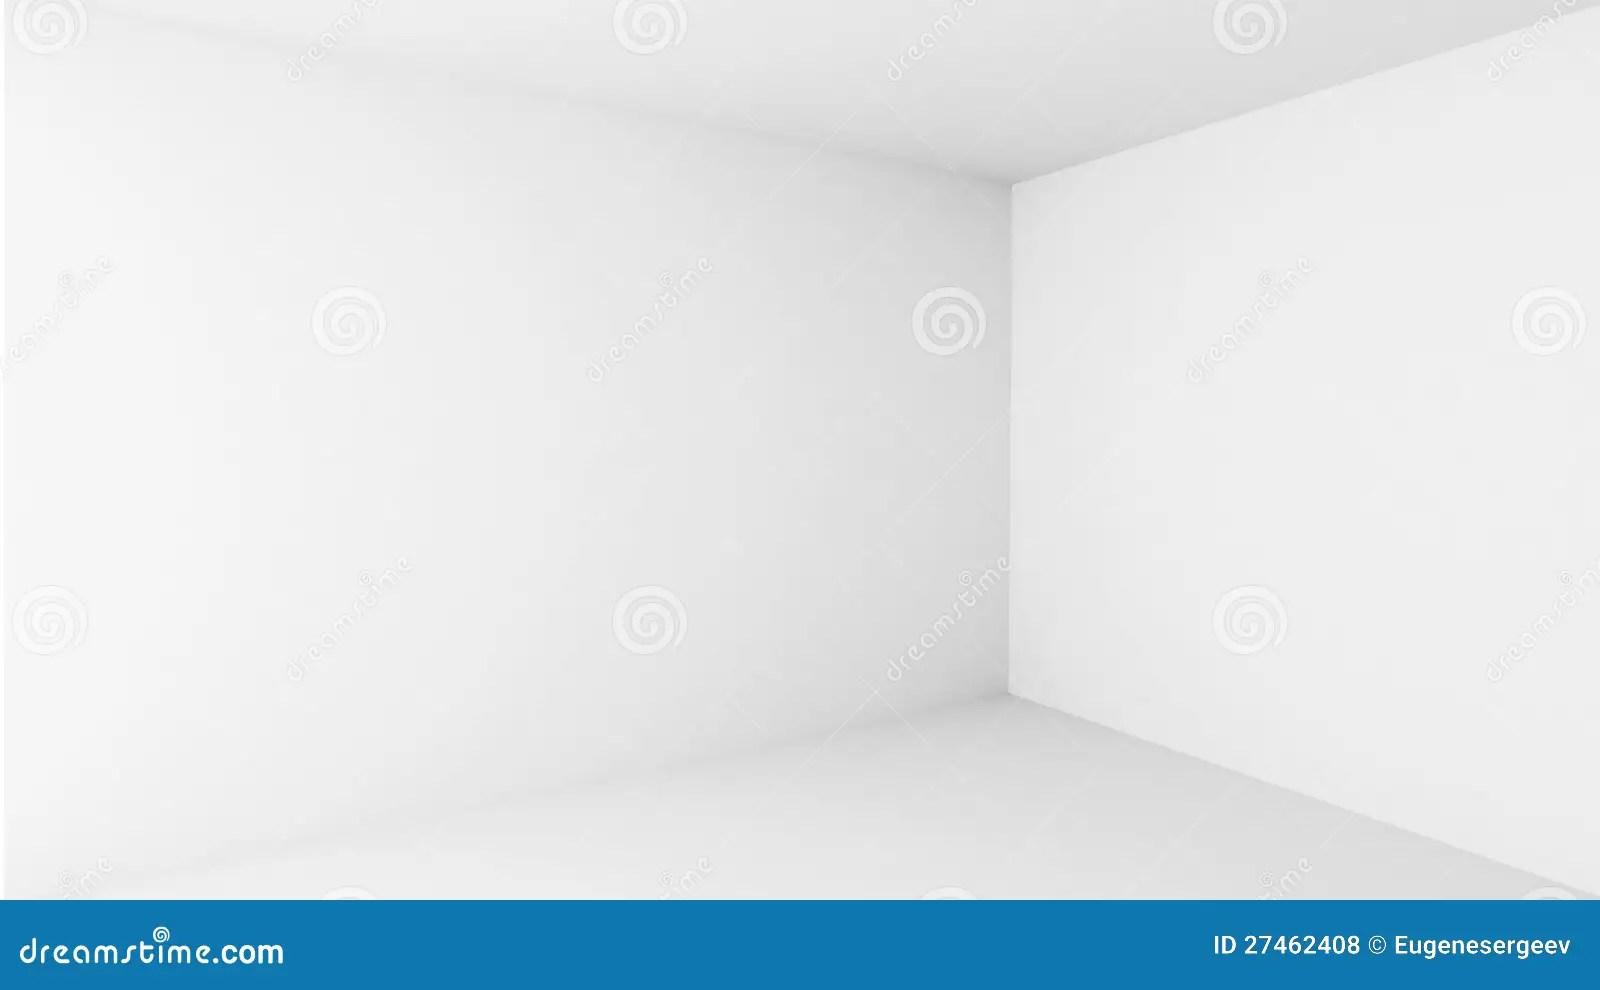 Simple Hall Decoration